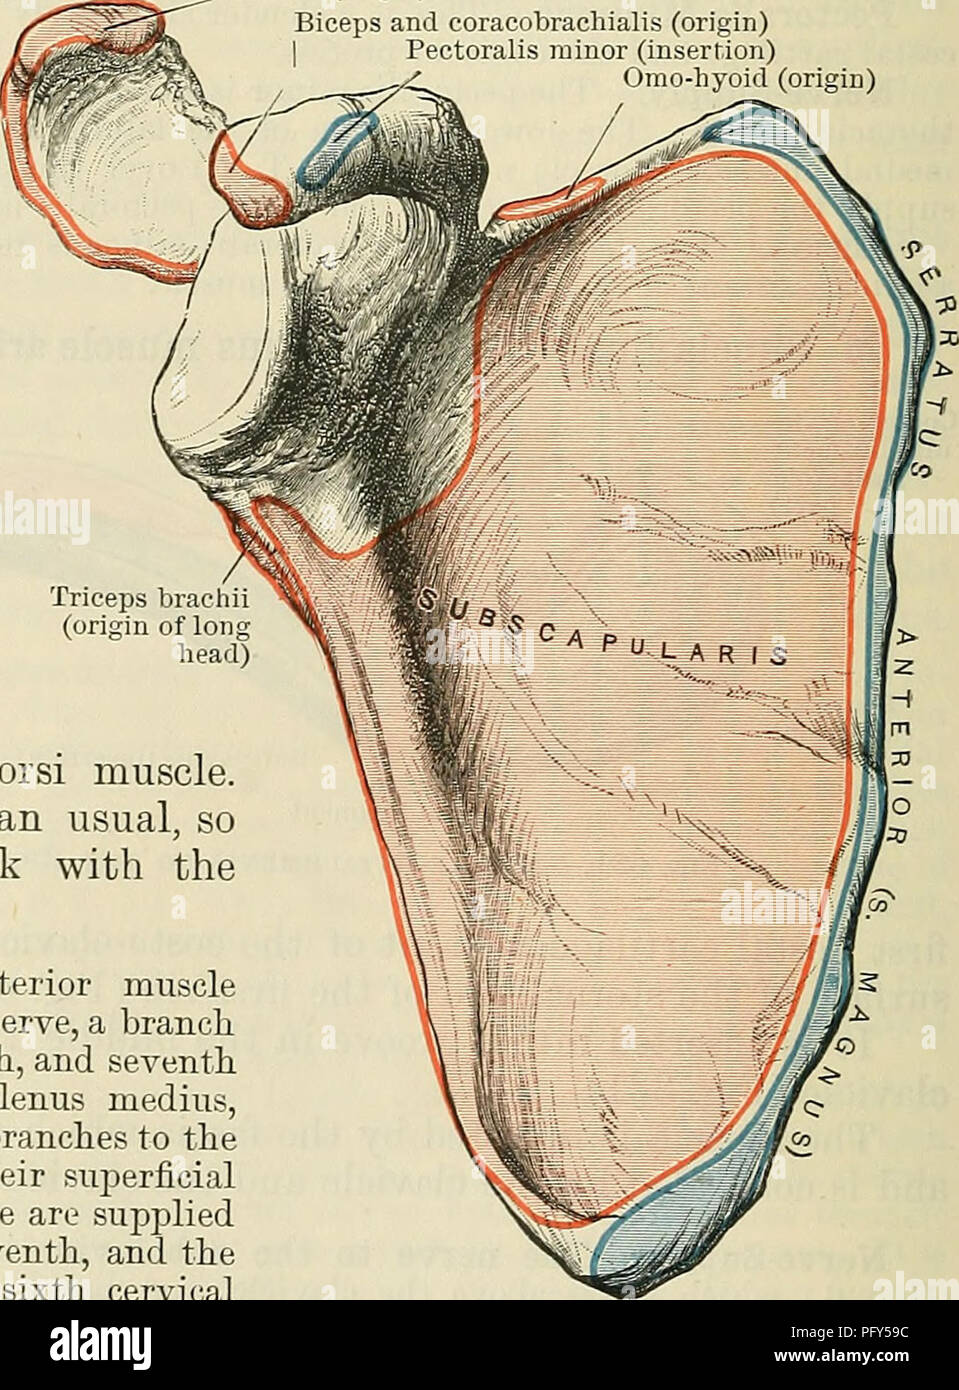 Serratus Anterior Muscle Imágenes De Stock & Serratus Anterior ...